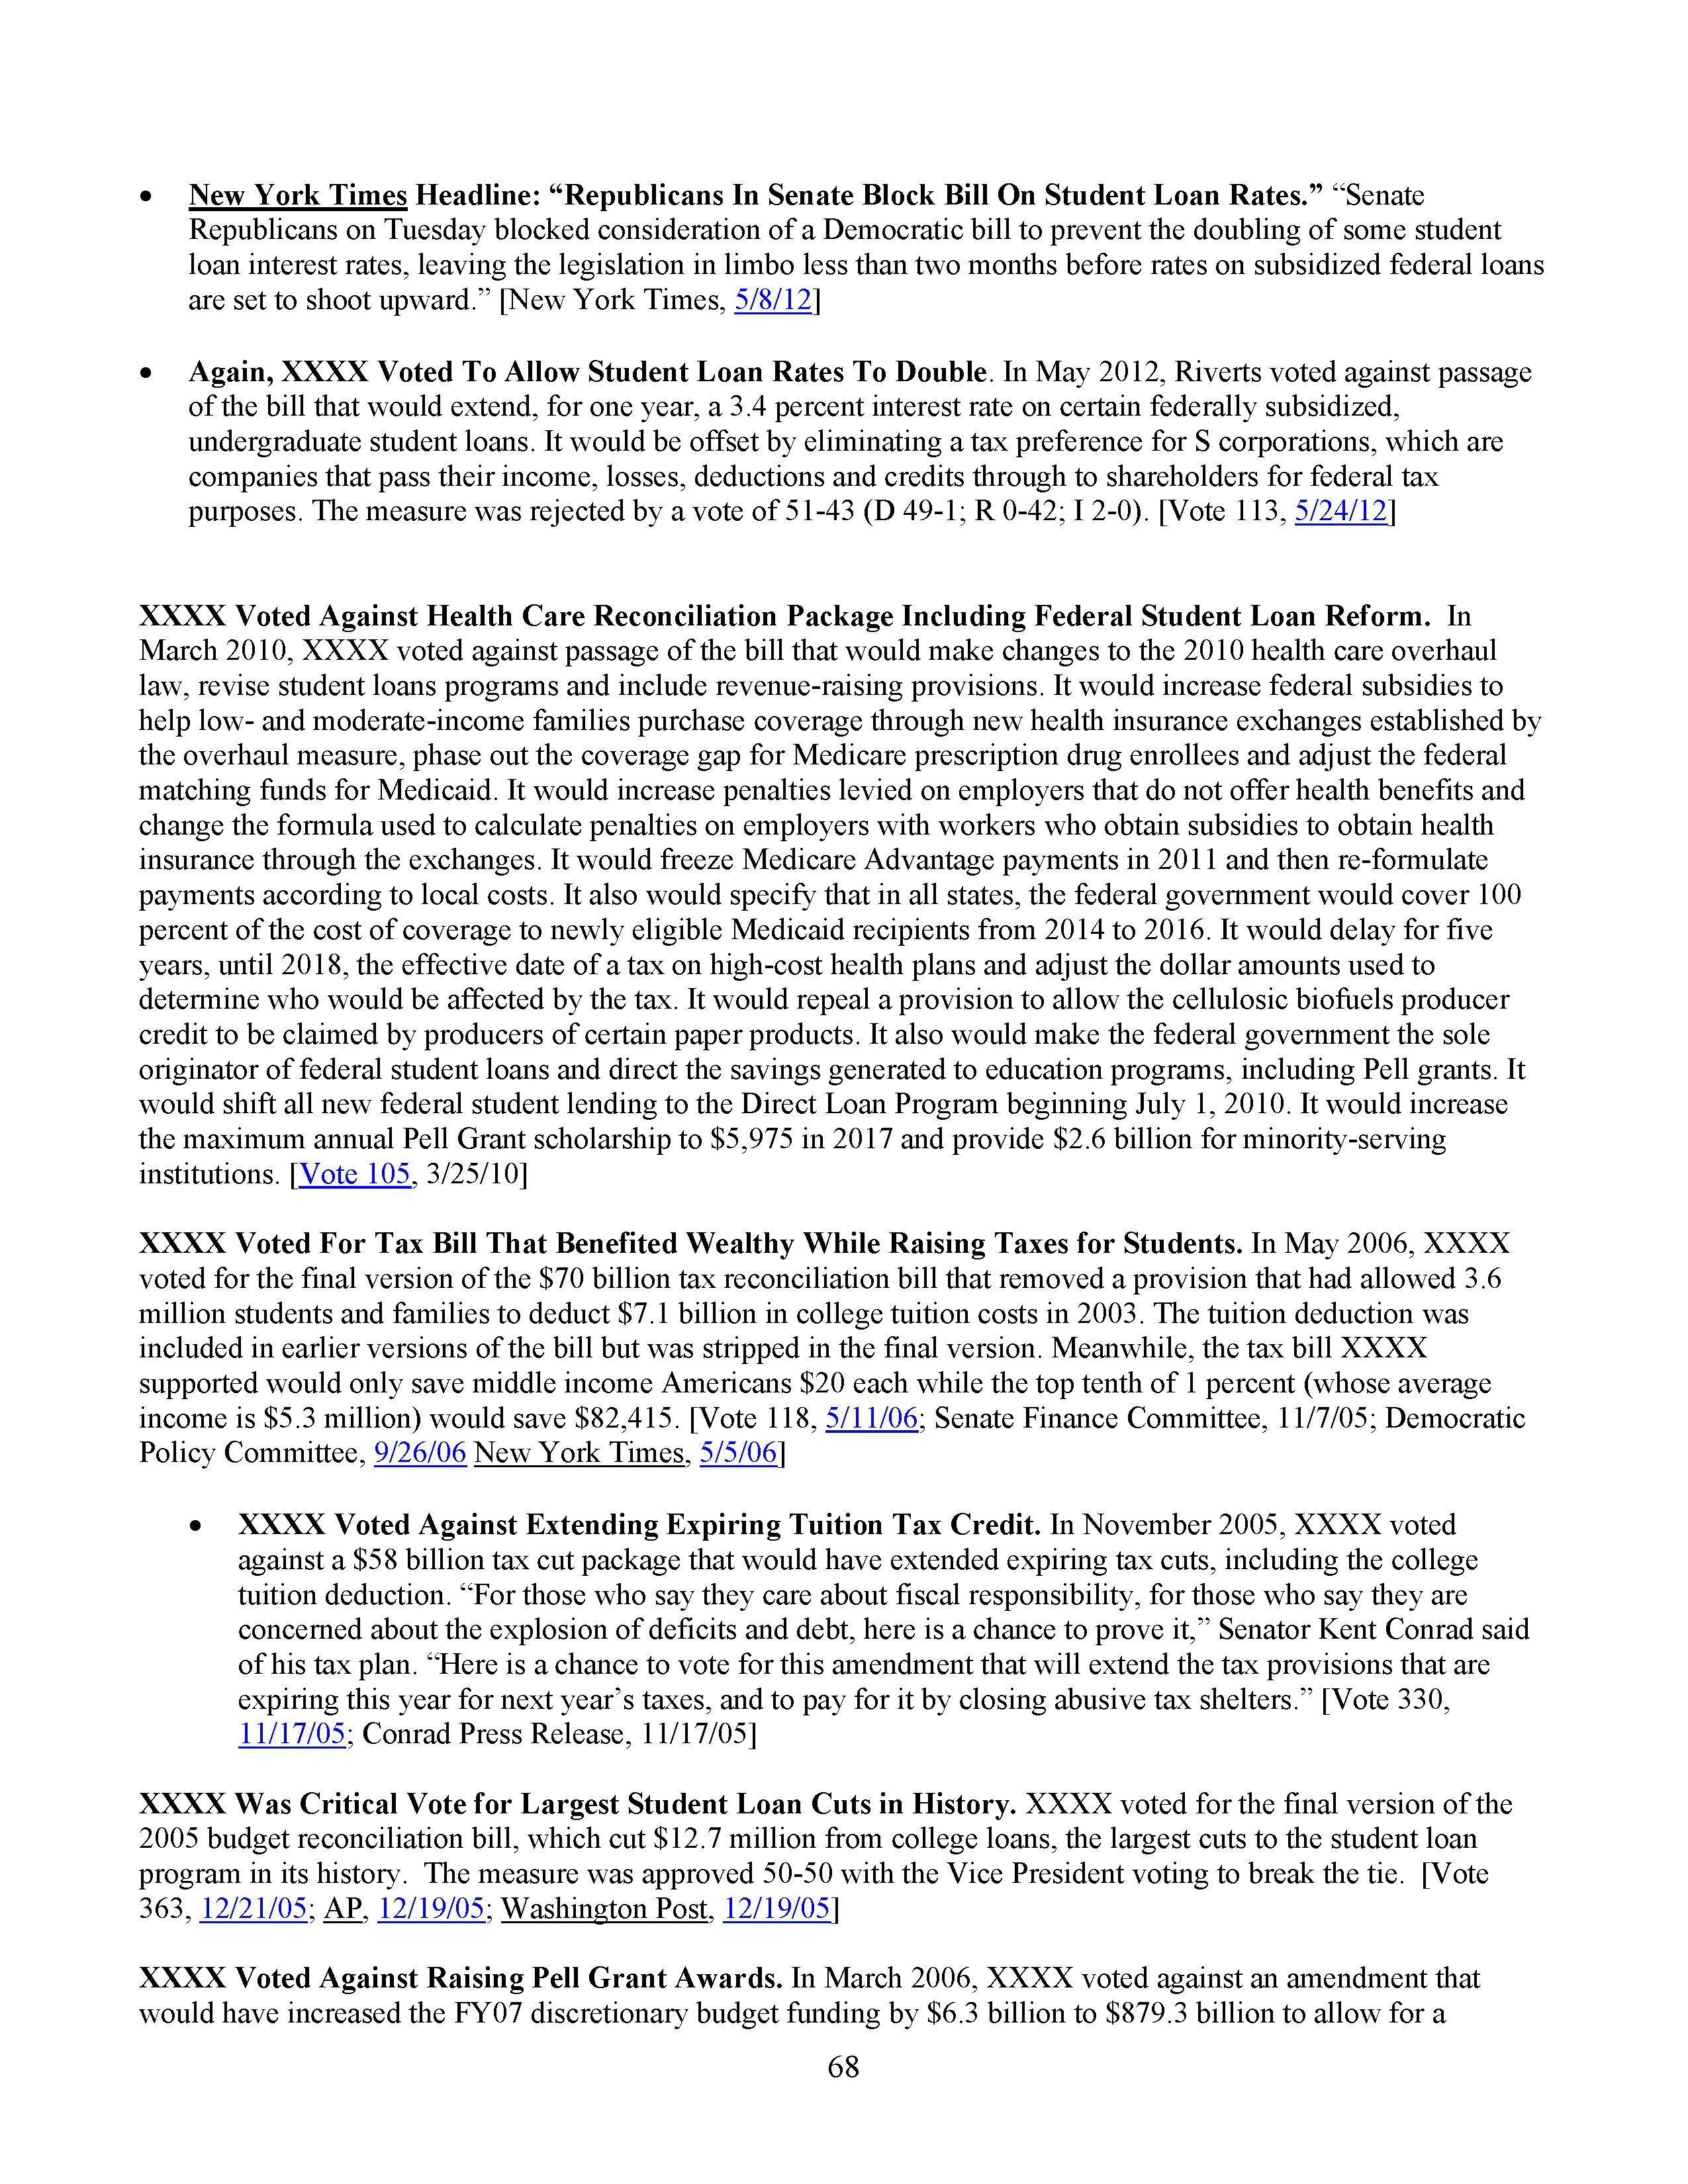 Hrc vote skeleton 68 new york times headline republicans in senate block bill on student loan rates senate republicans on tuesday blocked consideration of a democratic altavistaventures Image collections